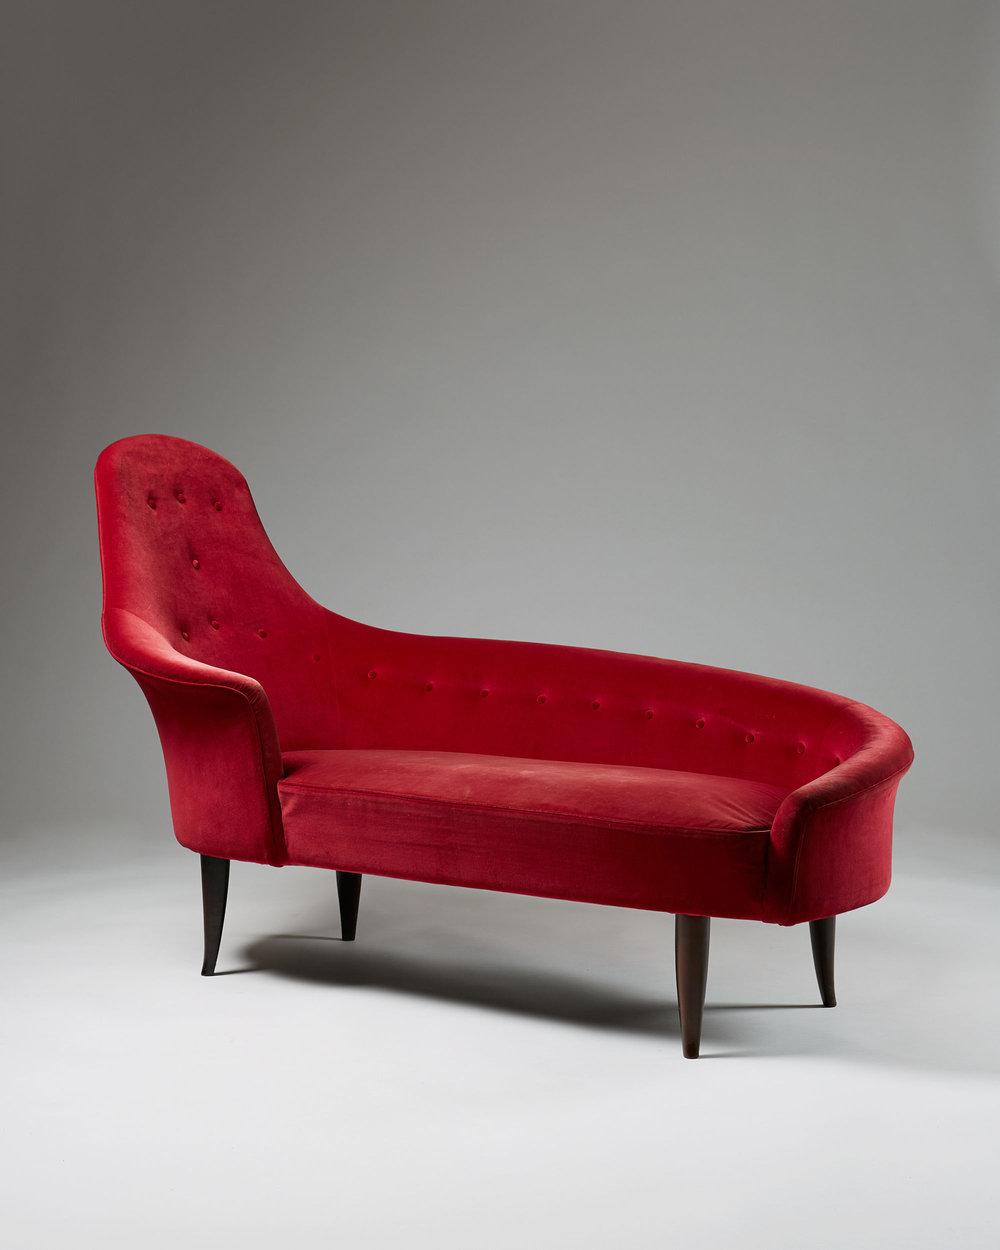 Chaise longue Garden of Eden designed by Kerstin Hörlin Holmquist for NK, Sweden. 1950's.